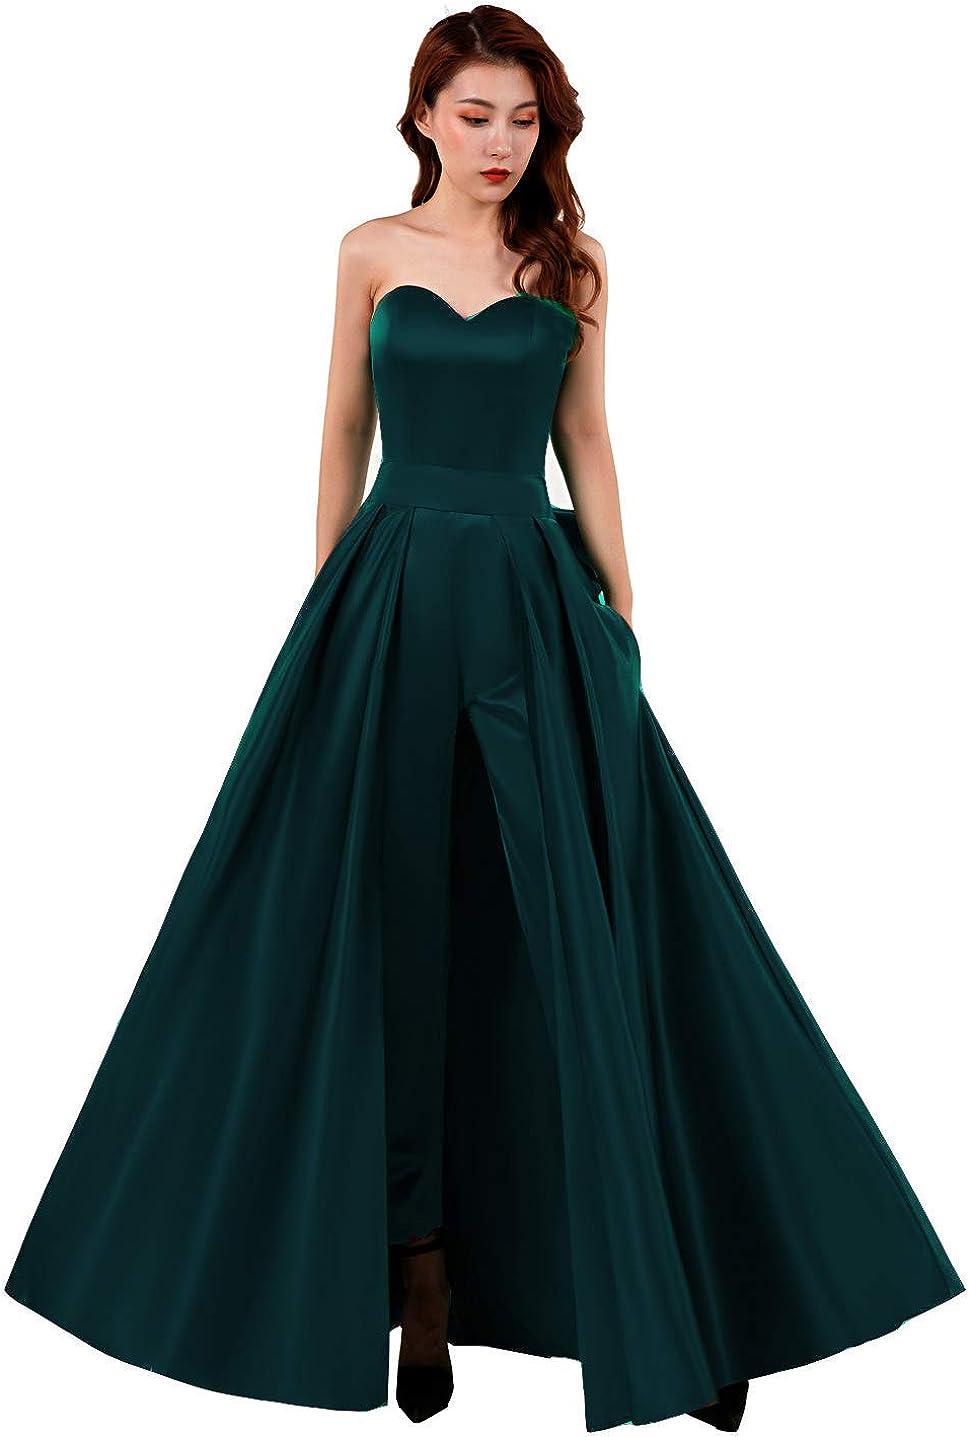 Honeydress Women's A Line Satin Jumpsuits Evening Dresses Detachable Skirt Sweetheart Prom Gowns Pants